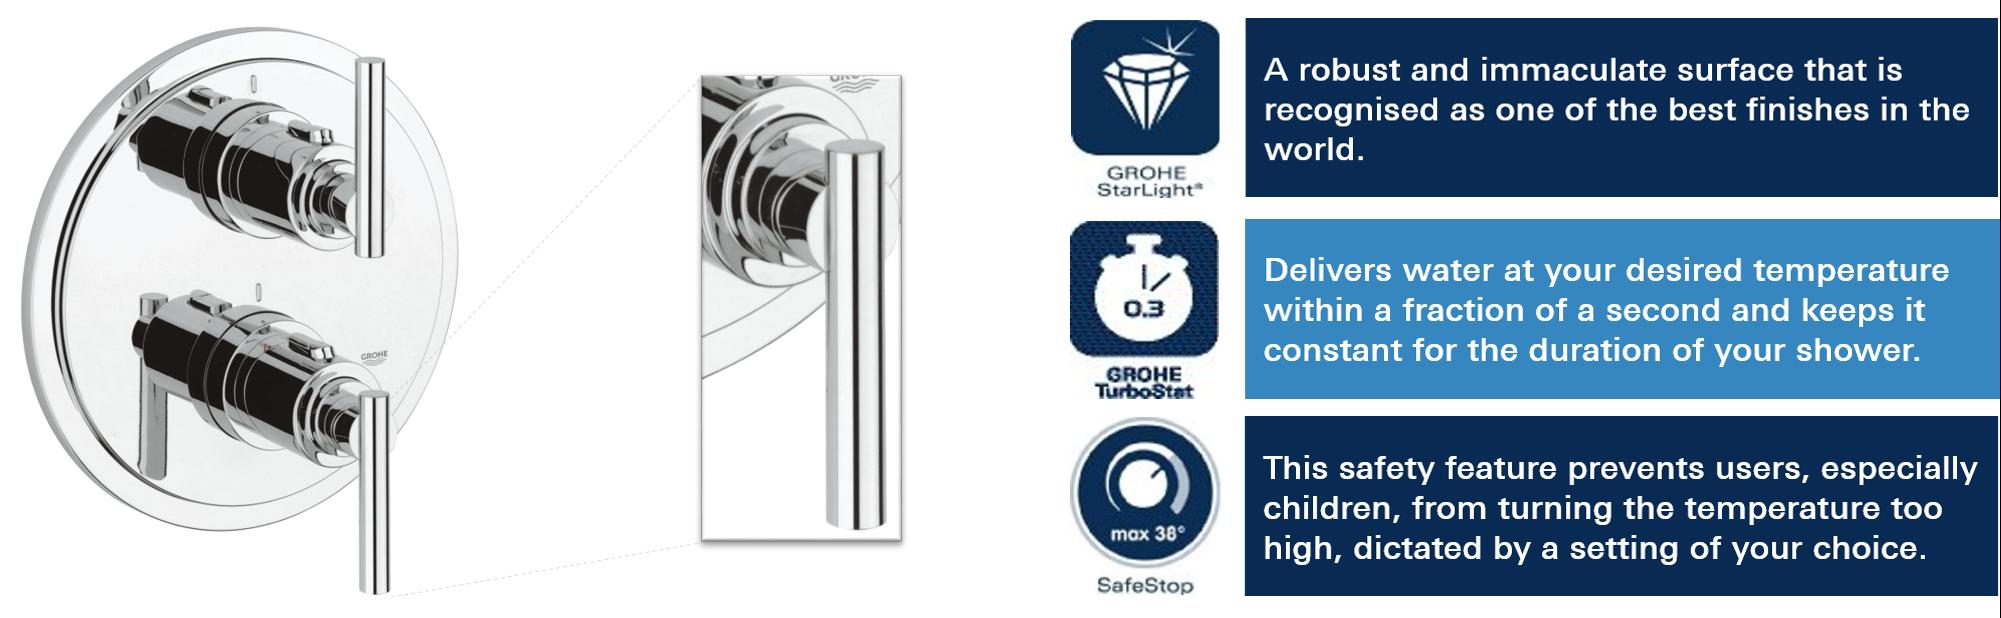 Modern Grohe Mixer Showers Ideas - Bathtub Design Ideas - klotsnet.com